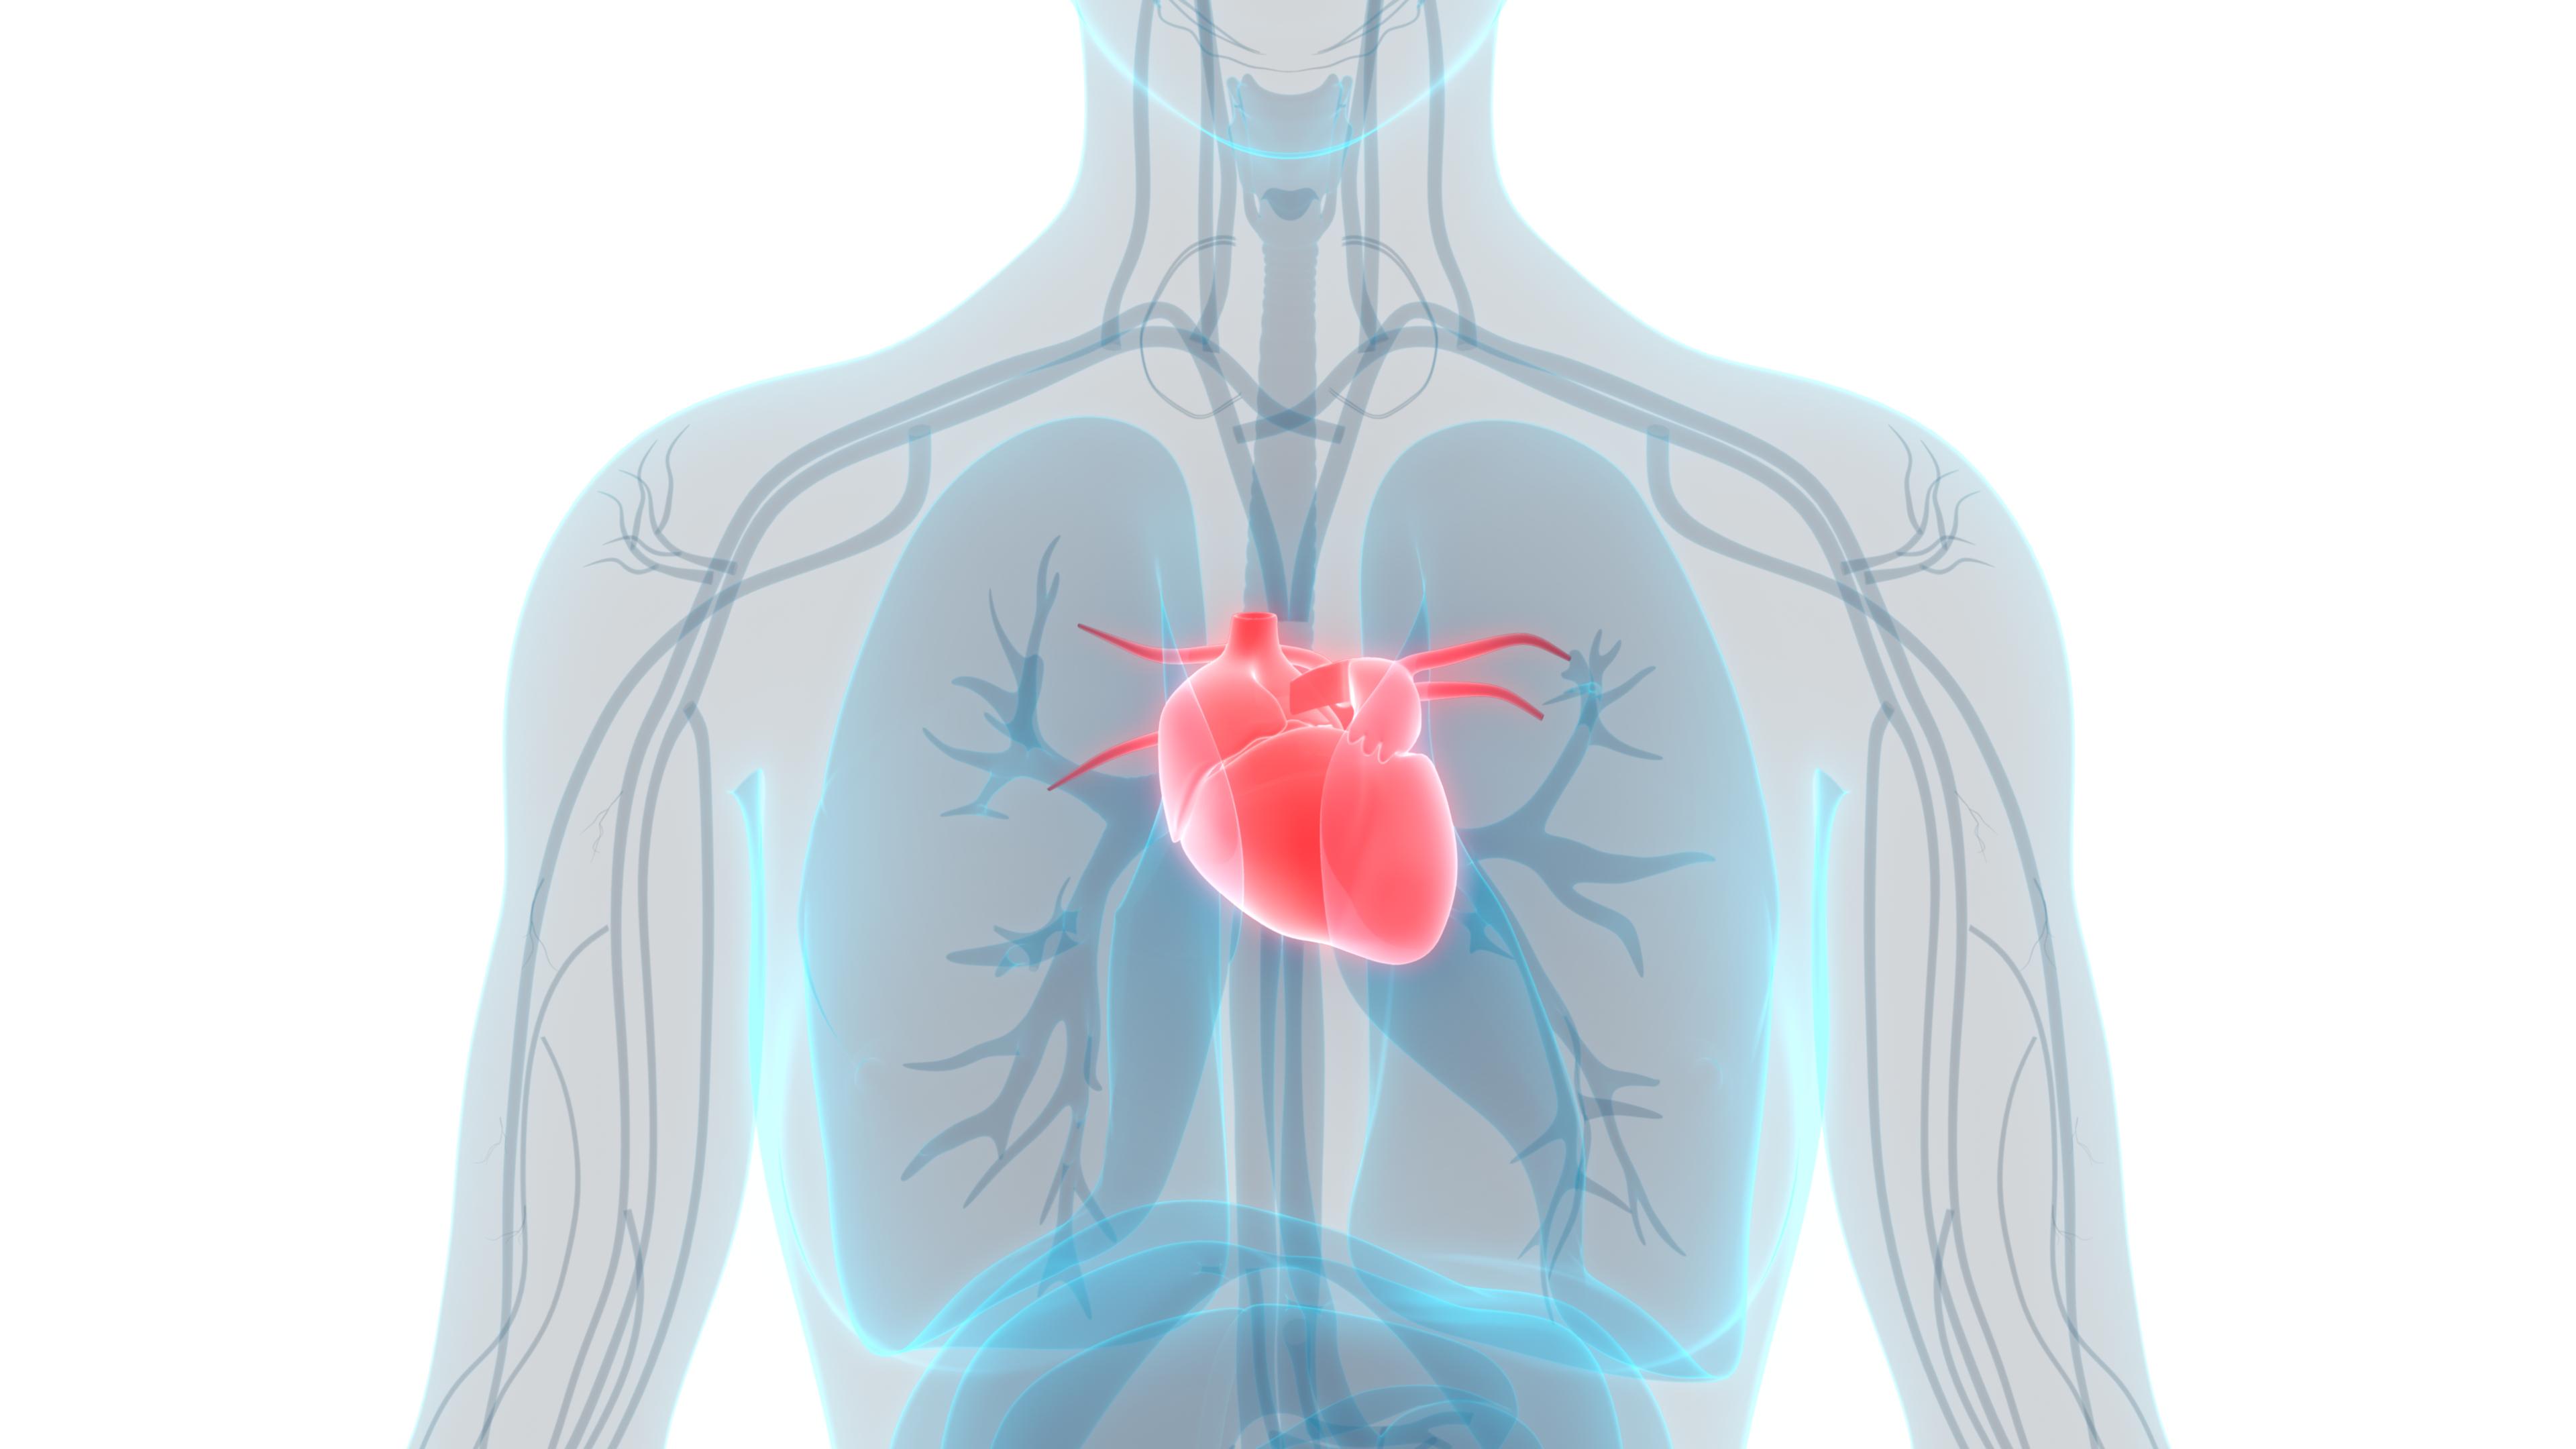 Post-approval transcatheter aortic valve implantation